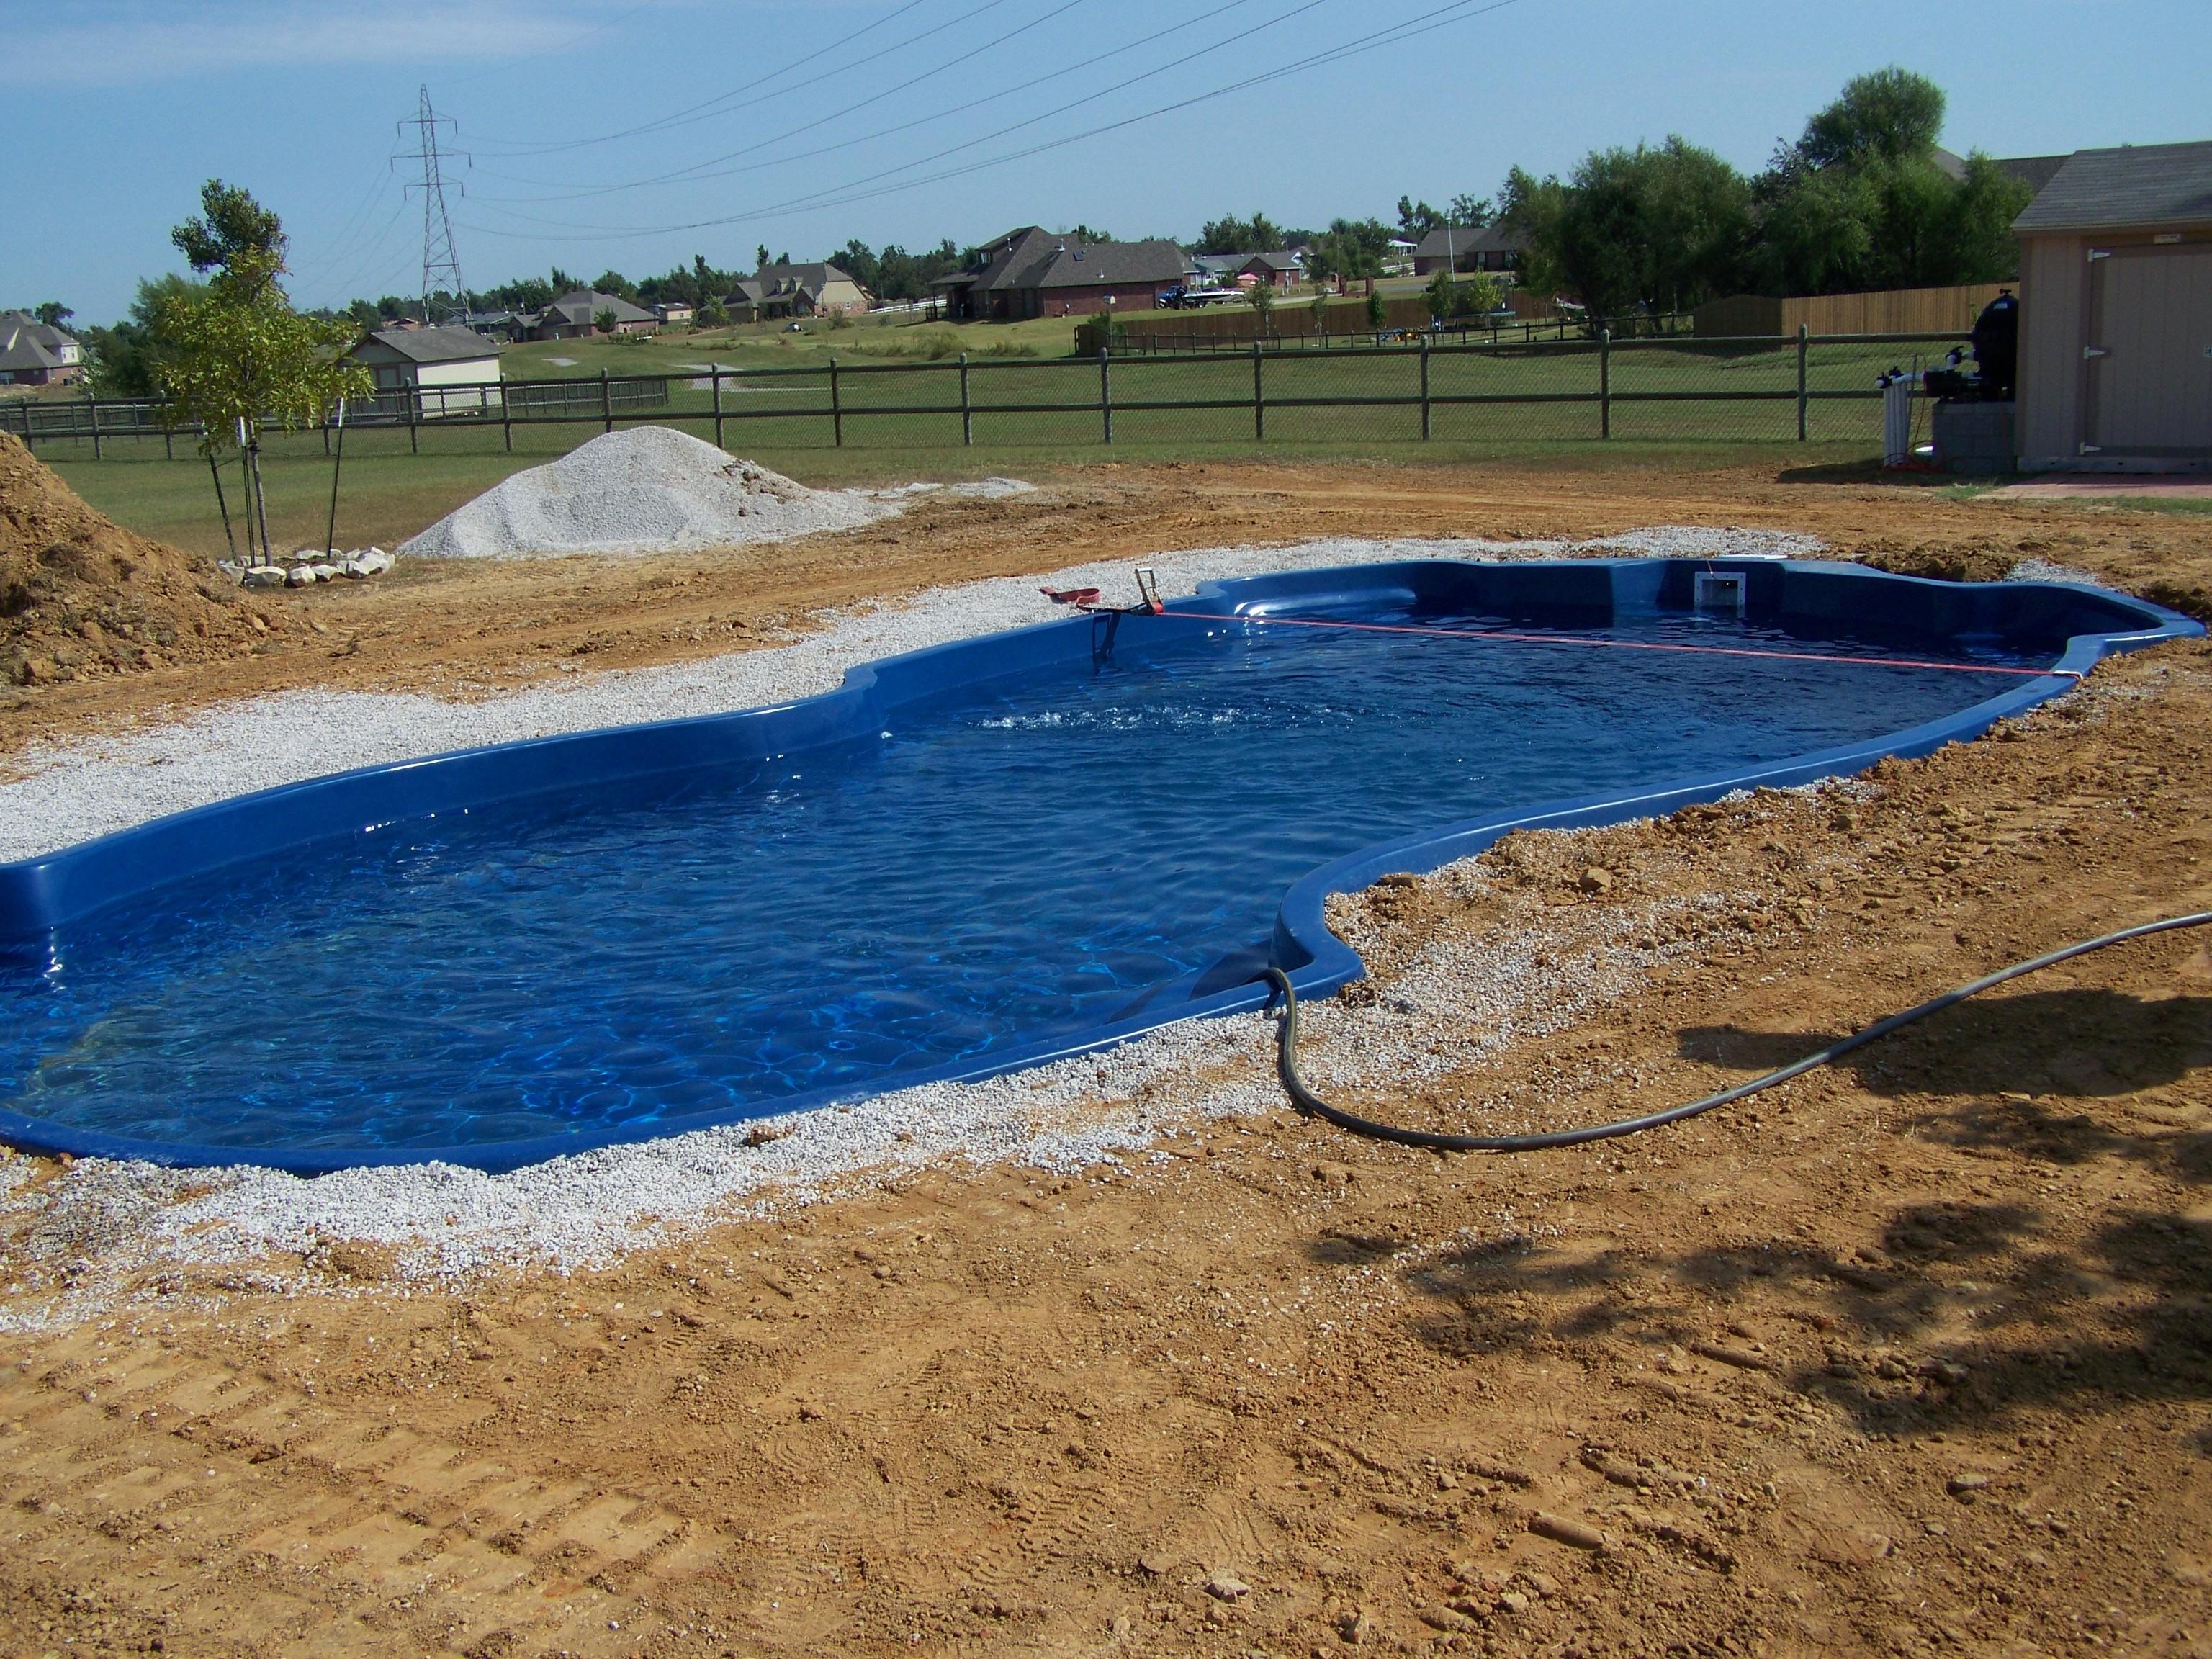 Finished installation of fiberglass pool.